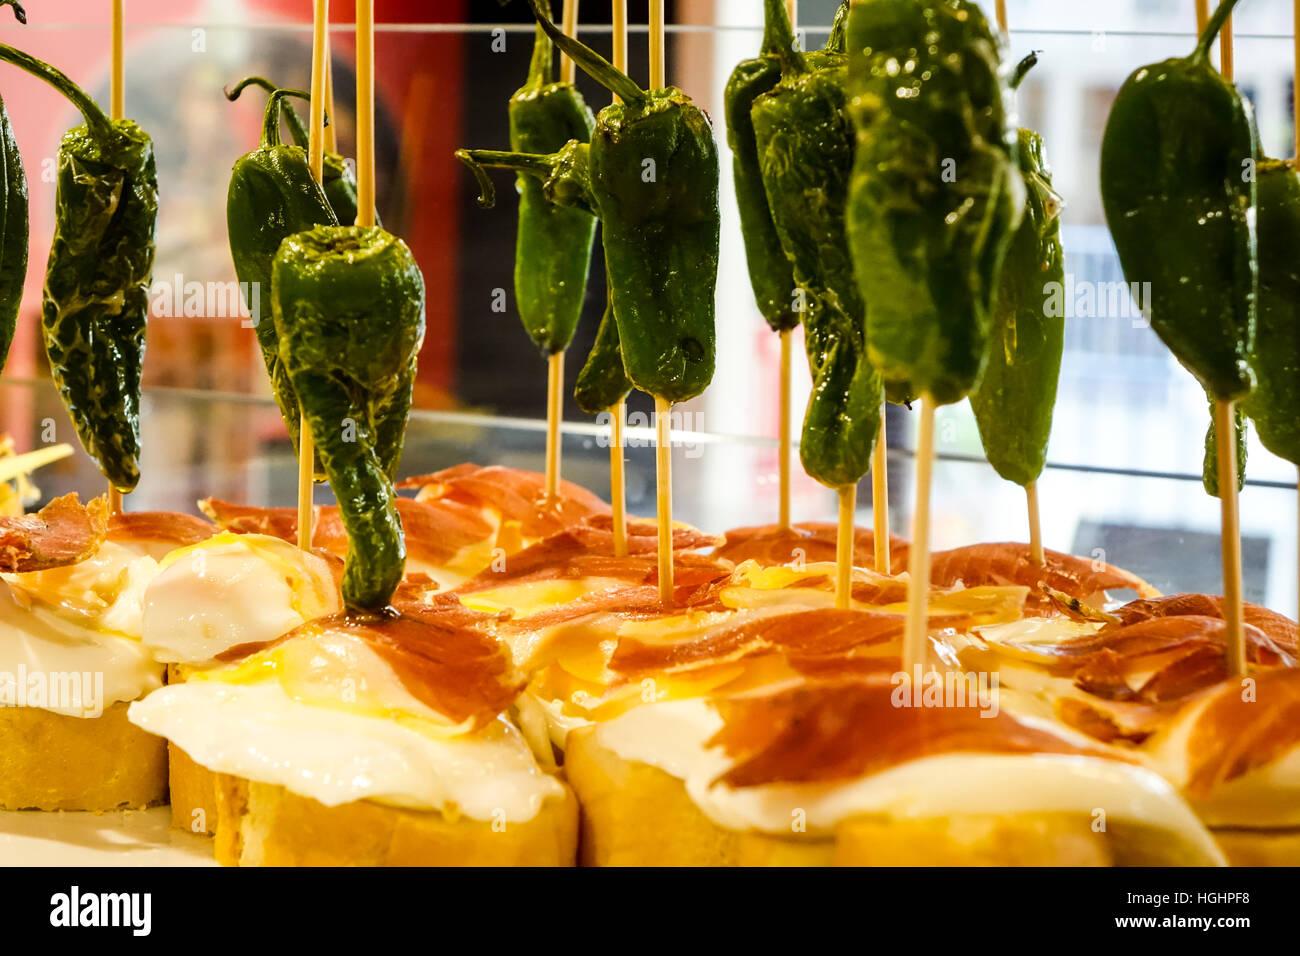 tapas-on-display-in-glass-cases-on-spanish-bar-HGHPF8.jpg